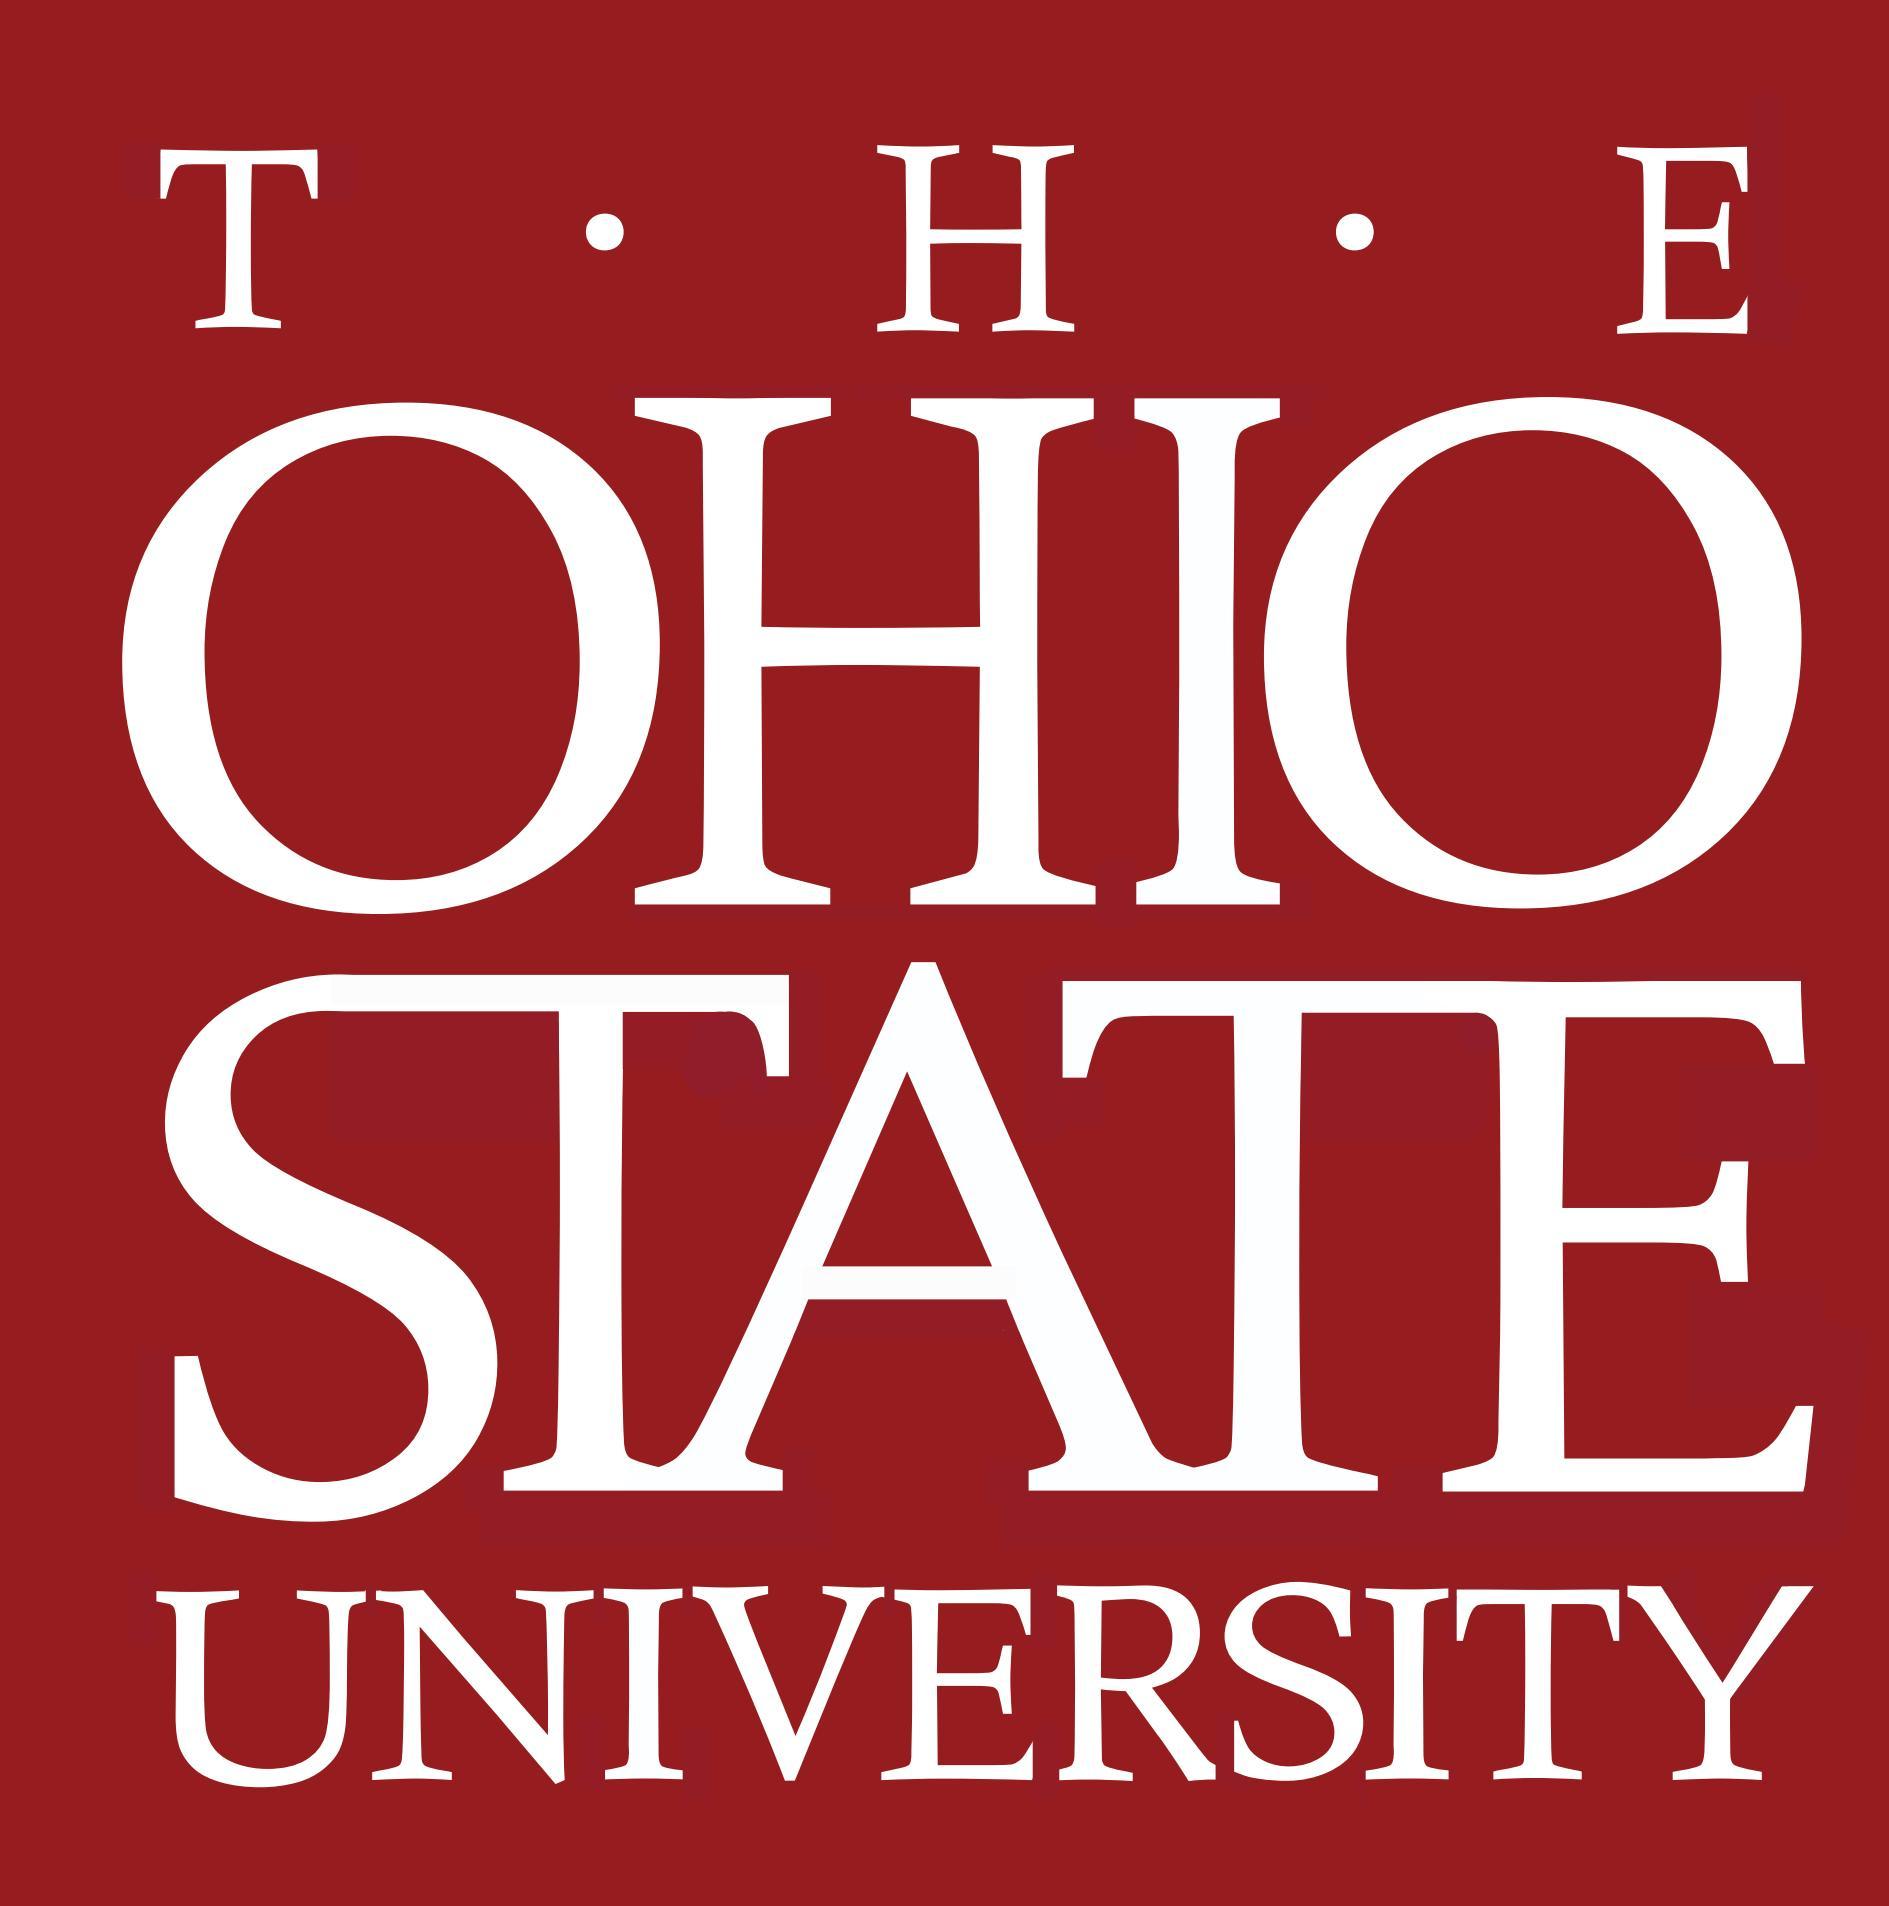 Ohio university logo clip art.